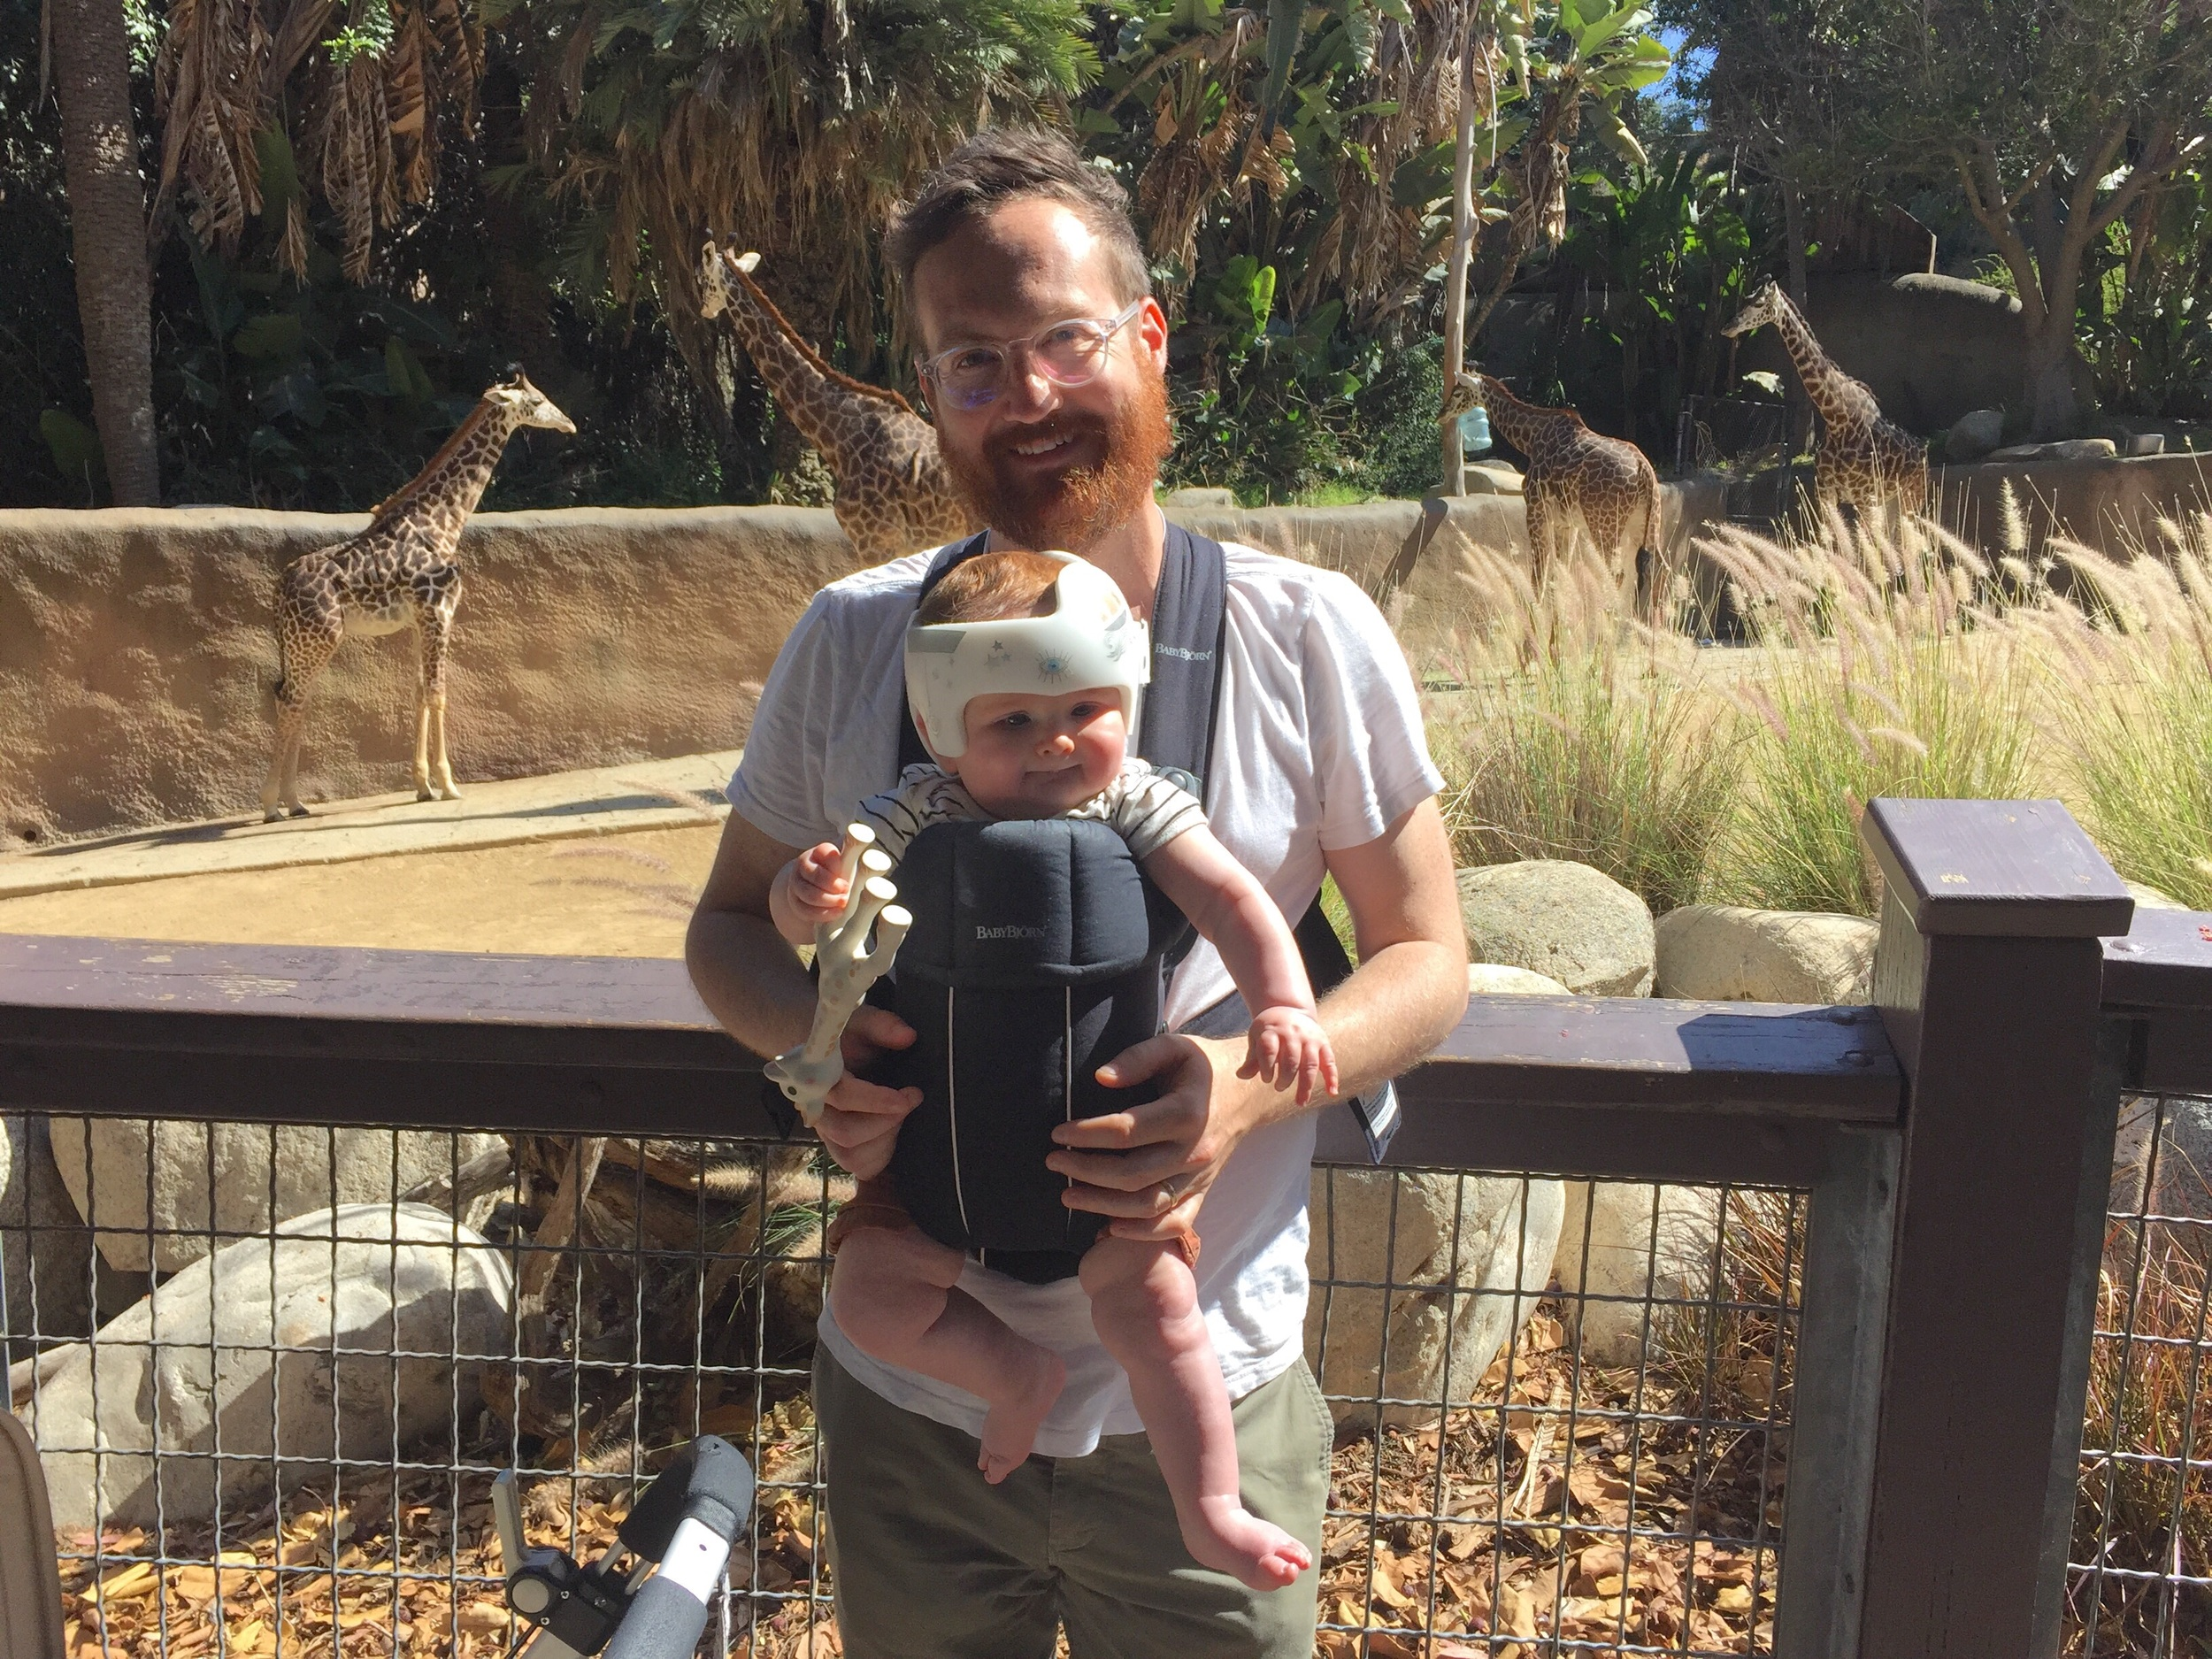 Nico enjoyed his visit to the zoo!